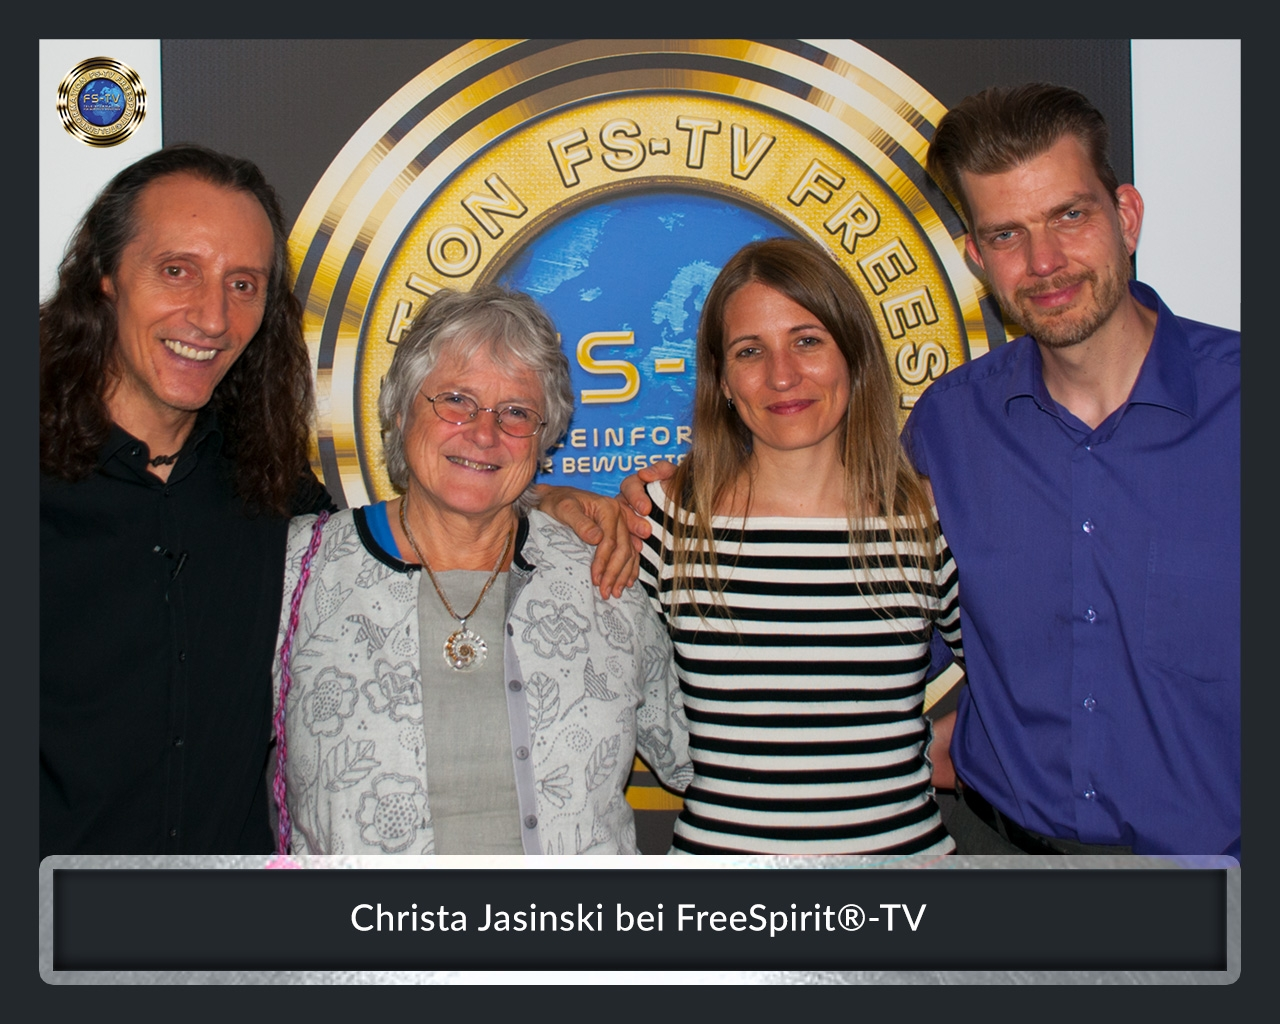 FS-TV-Bildergallerie-Christa-Jasinski2